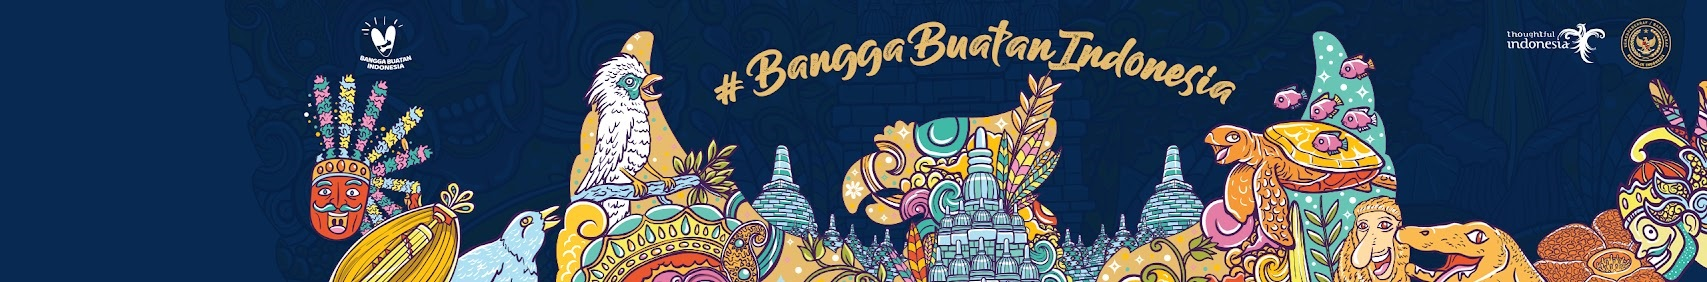 #BanggaBuatanIndonesia